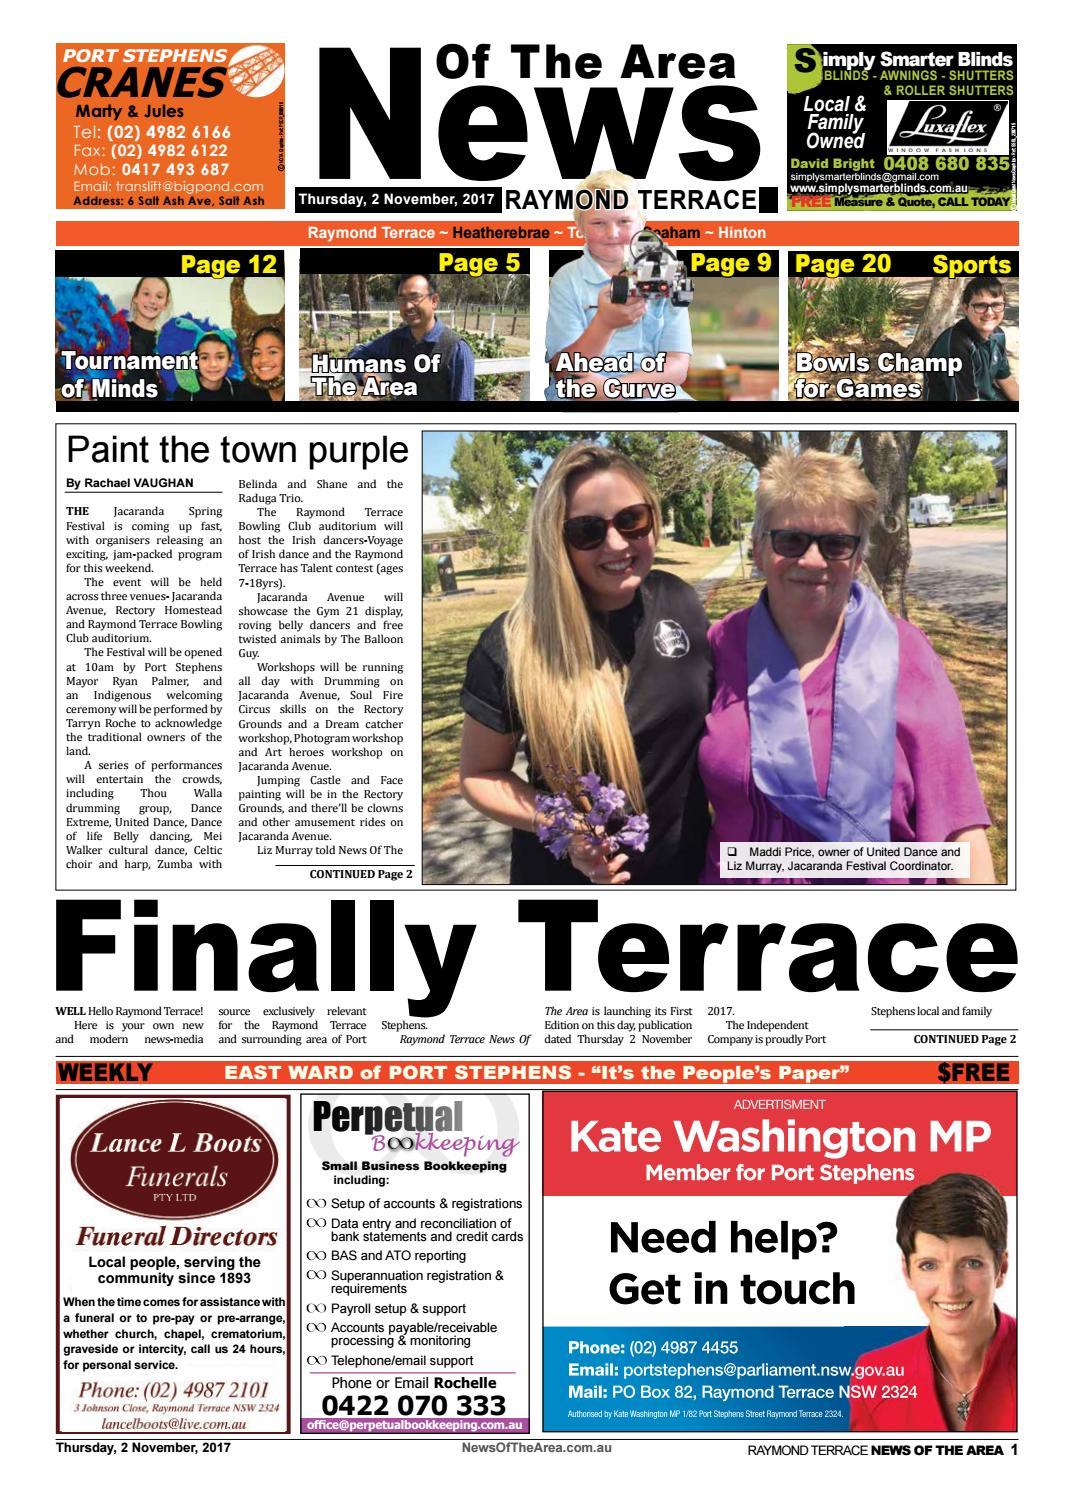 Raymond terrace news of the area 2 november 2017 by News Of